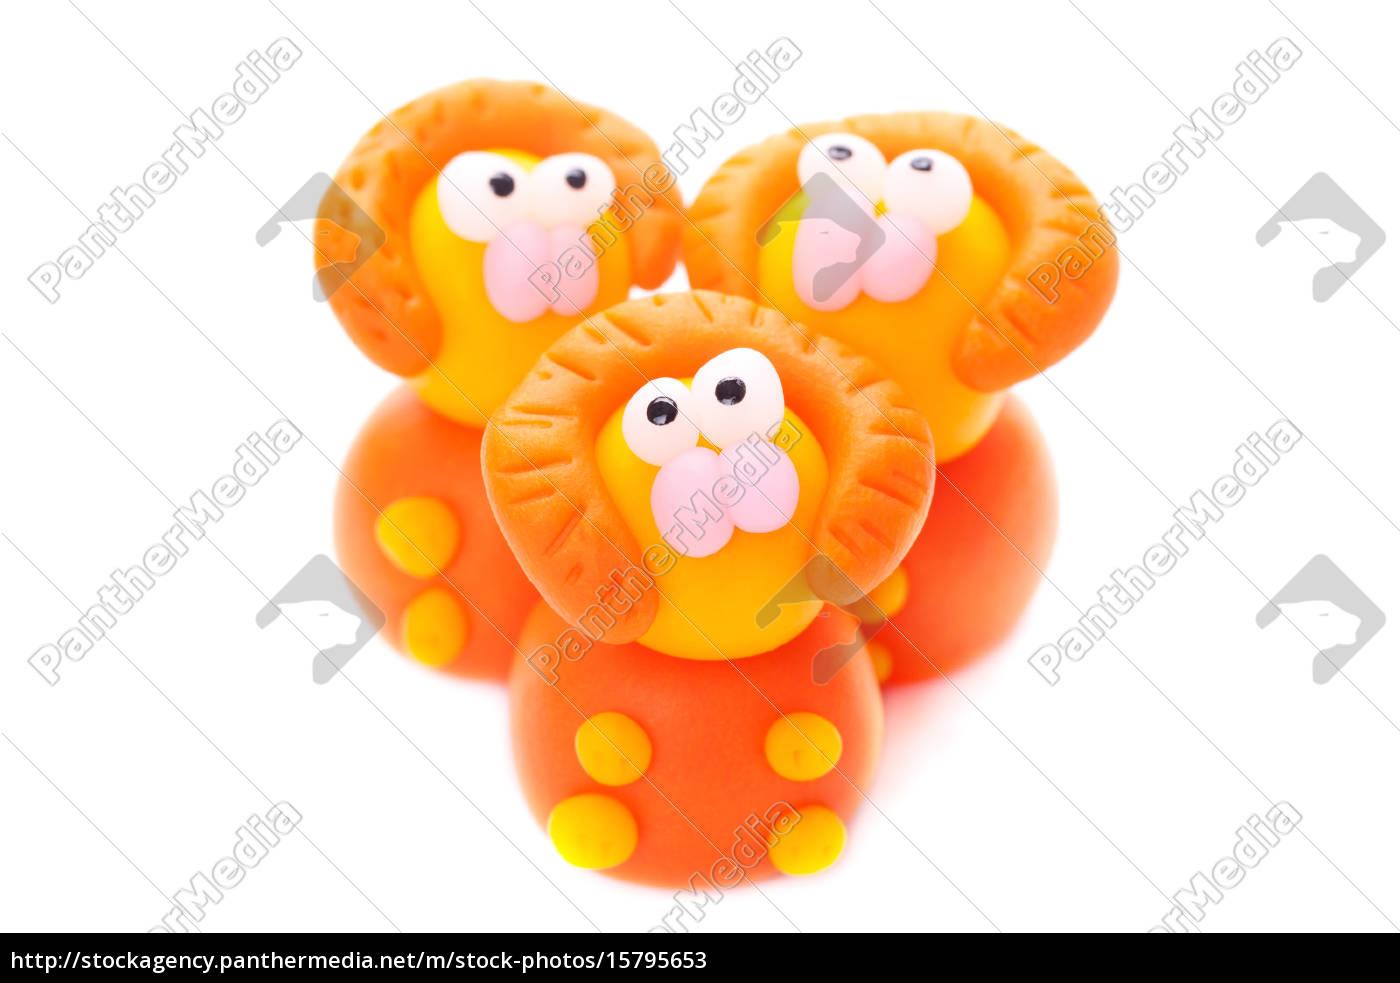 lions - 15795653